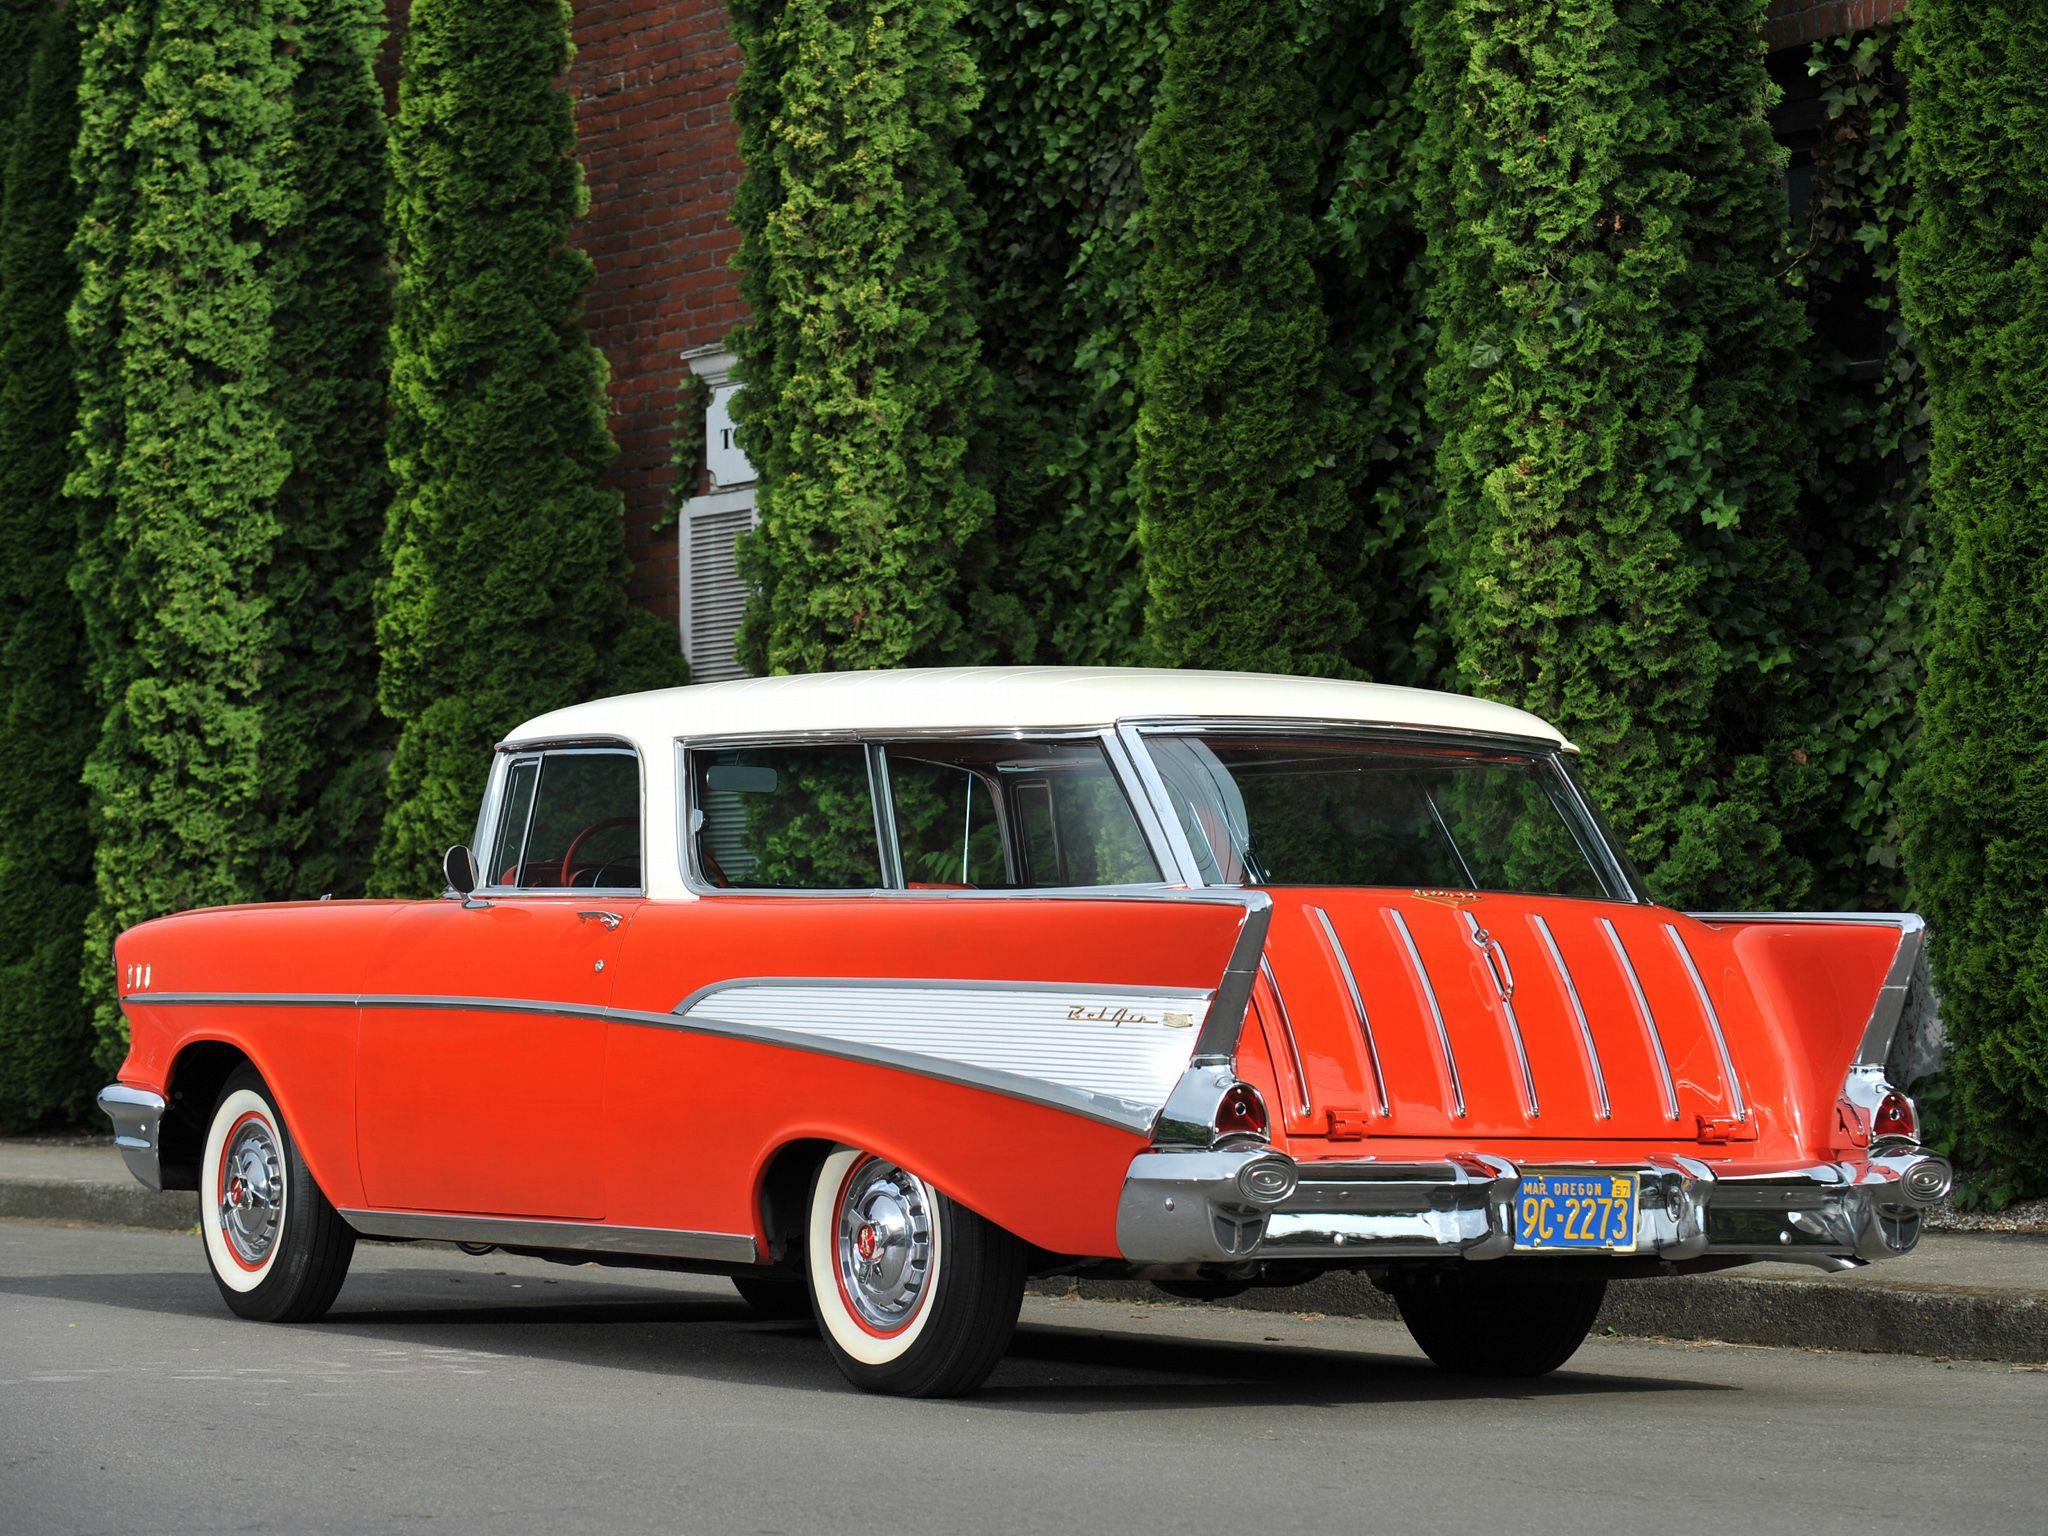 1957 Chevrolet Bel Air Nomad Classic Chevrolet Bel Air 1957